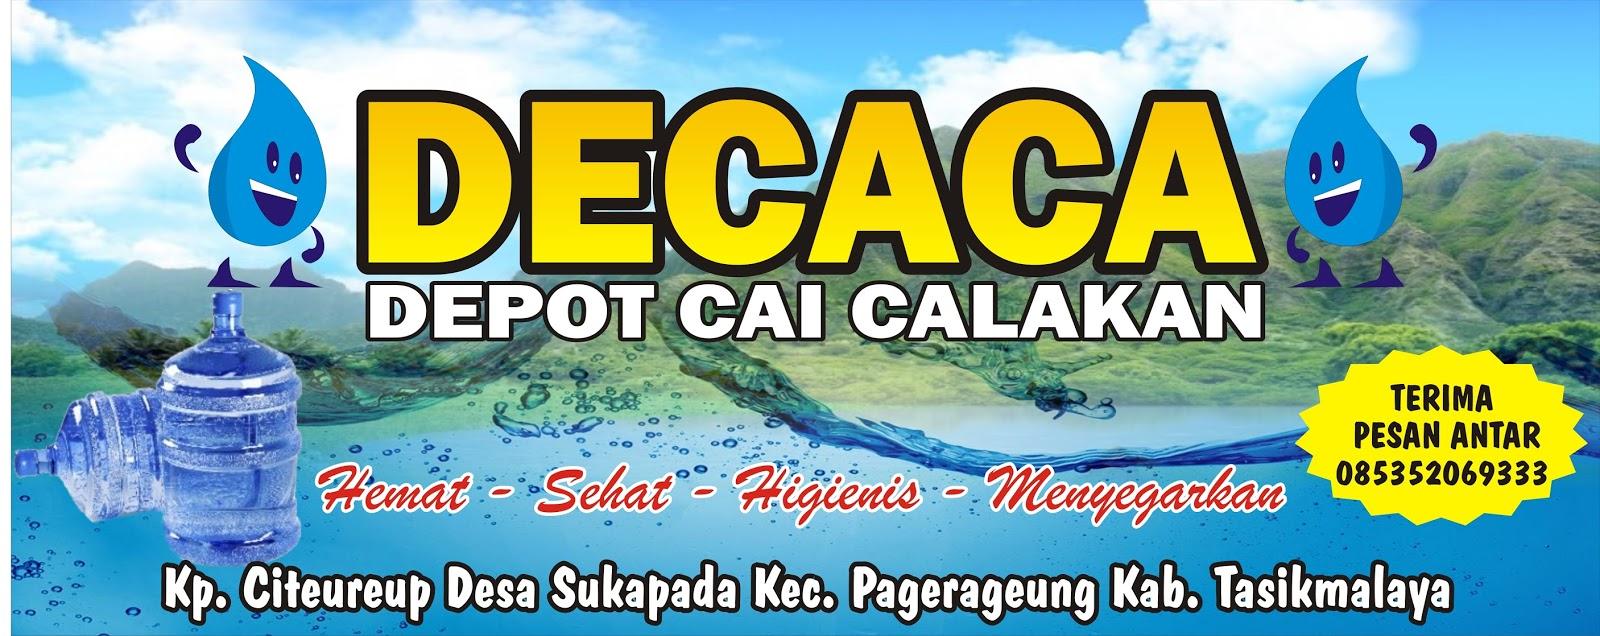 Download Contoh Spanduk Depot Isi Ulang Air Minum Format Cdr